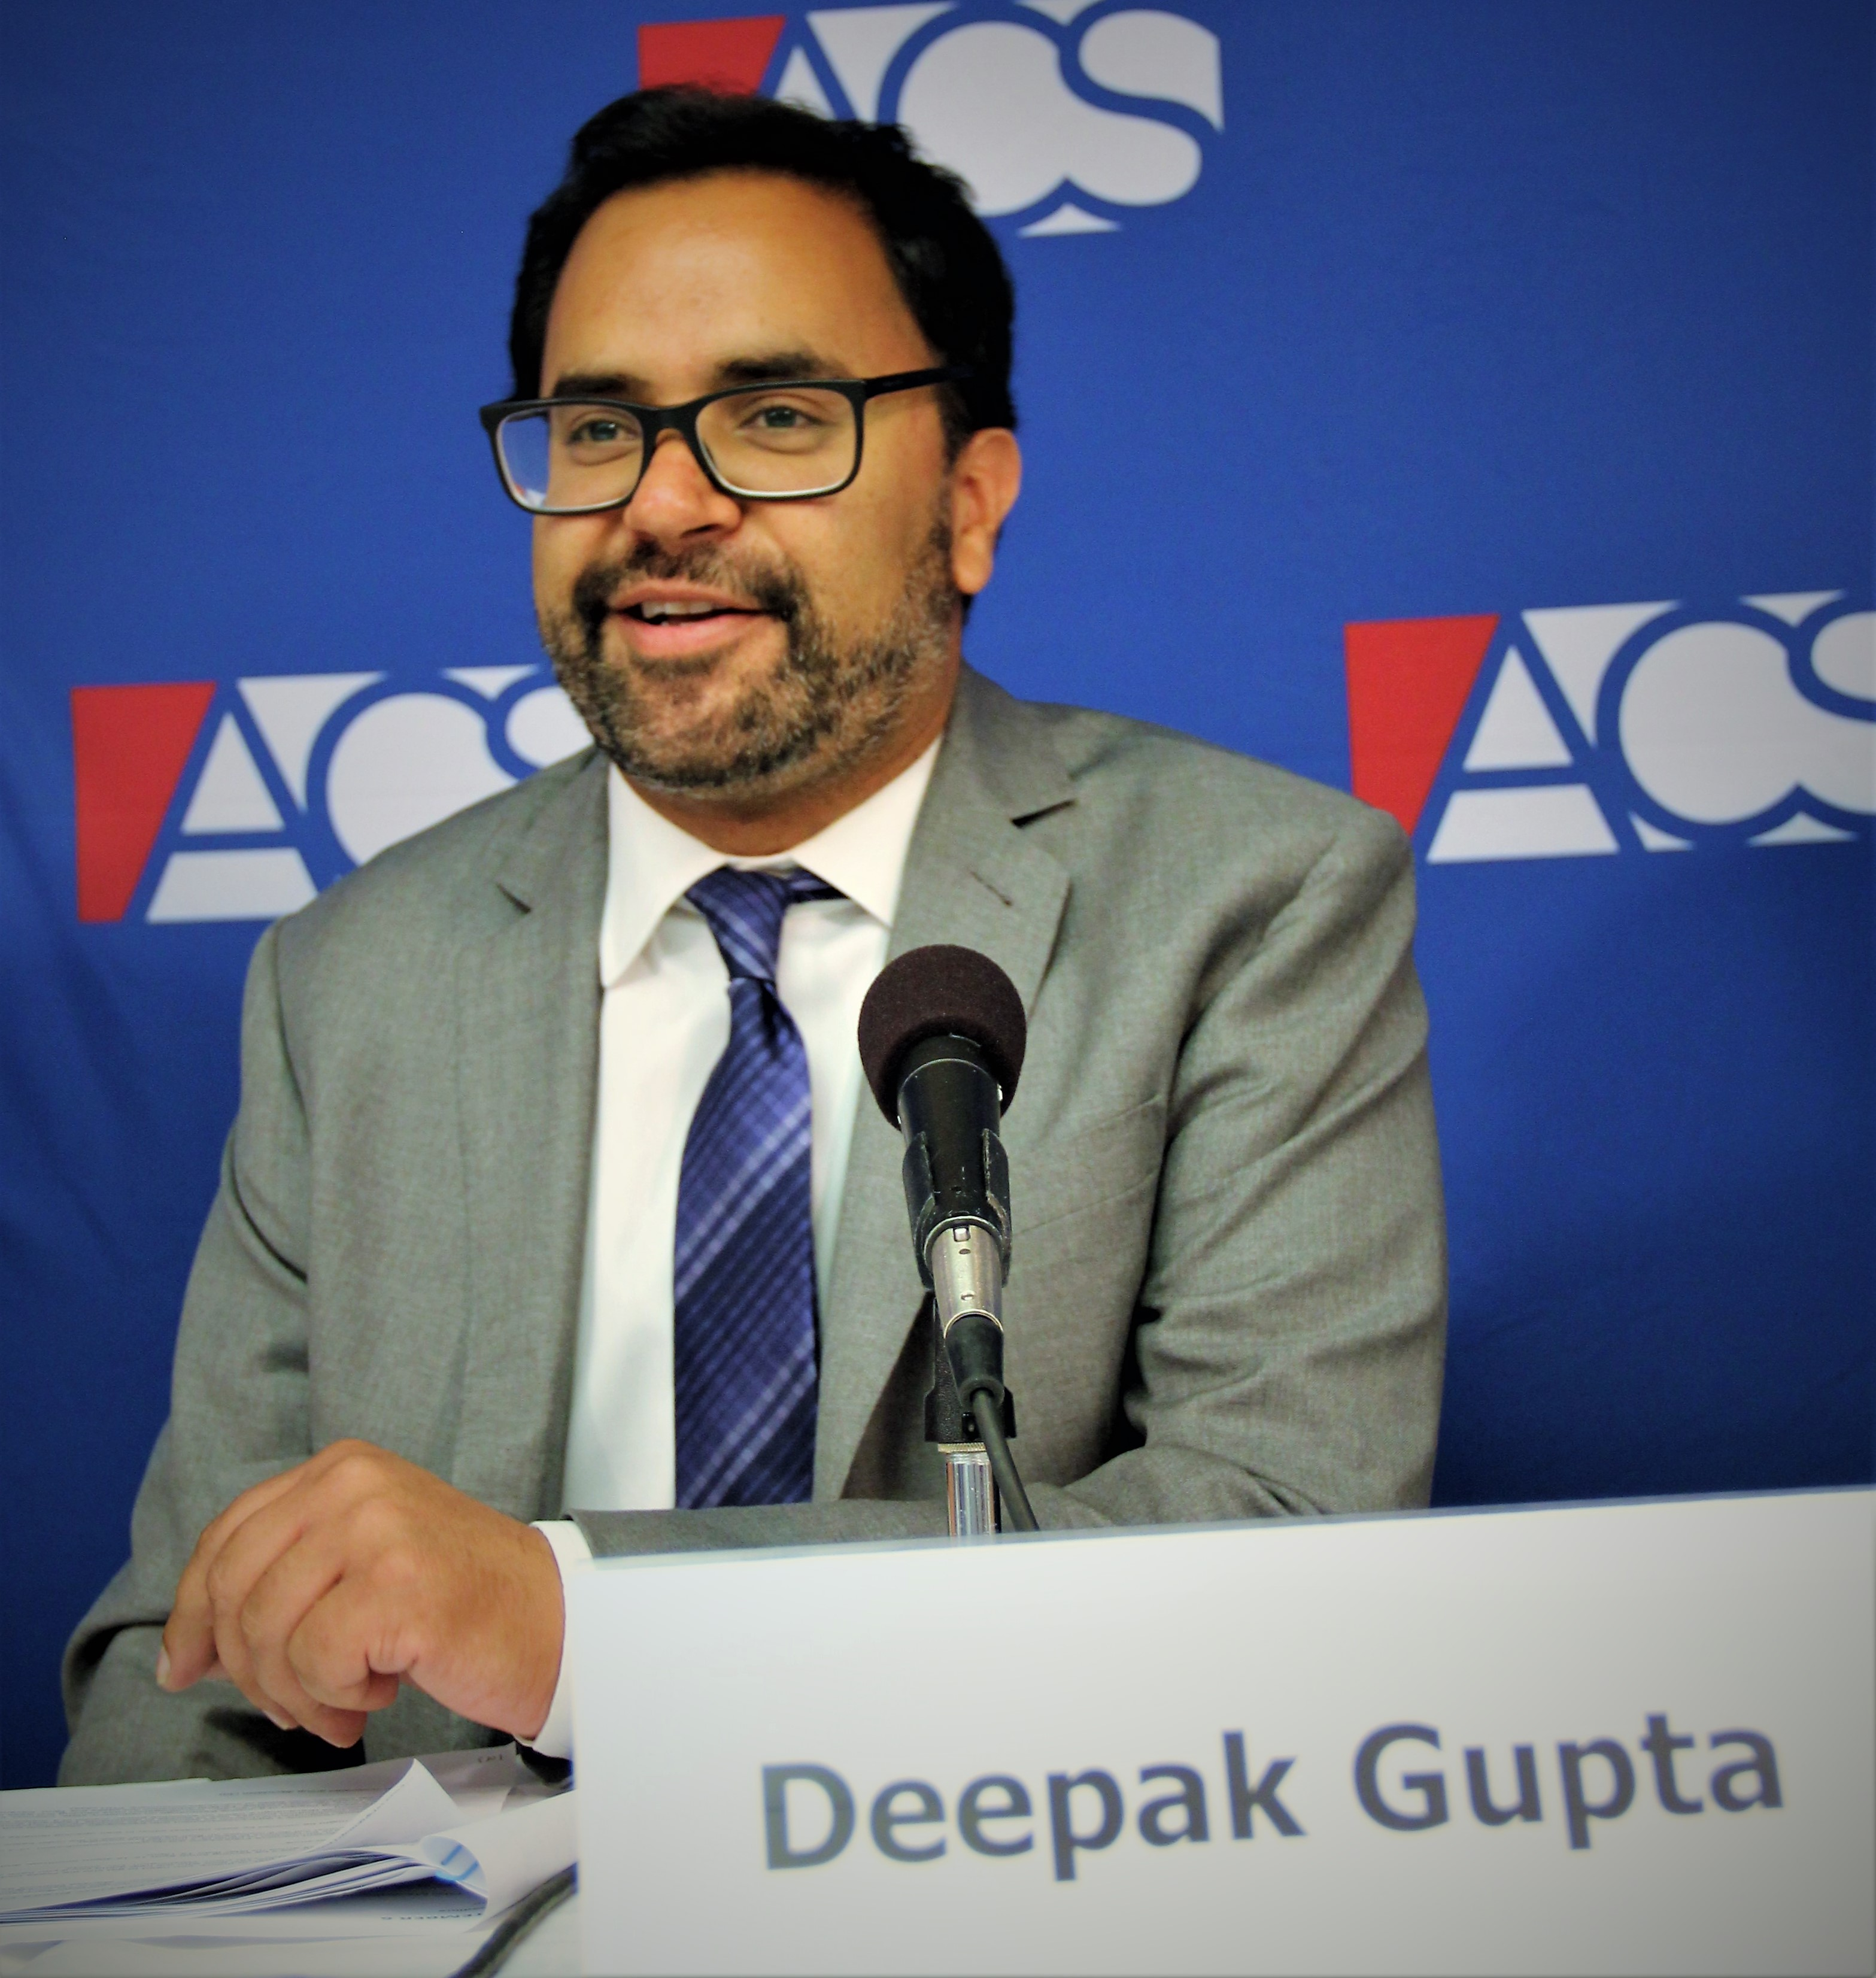 Deepak Gupta speaks at the 2018 ACS Supreme Court Preview, September 6 2018